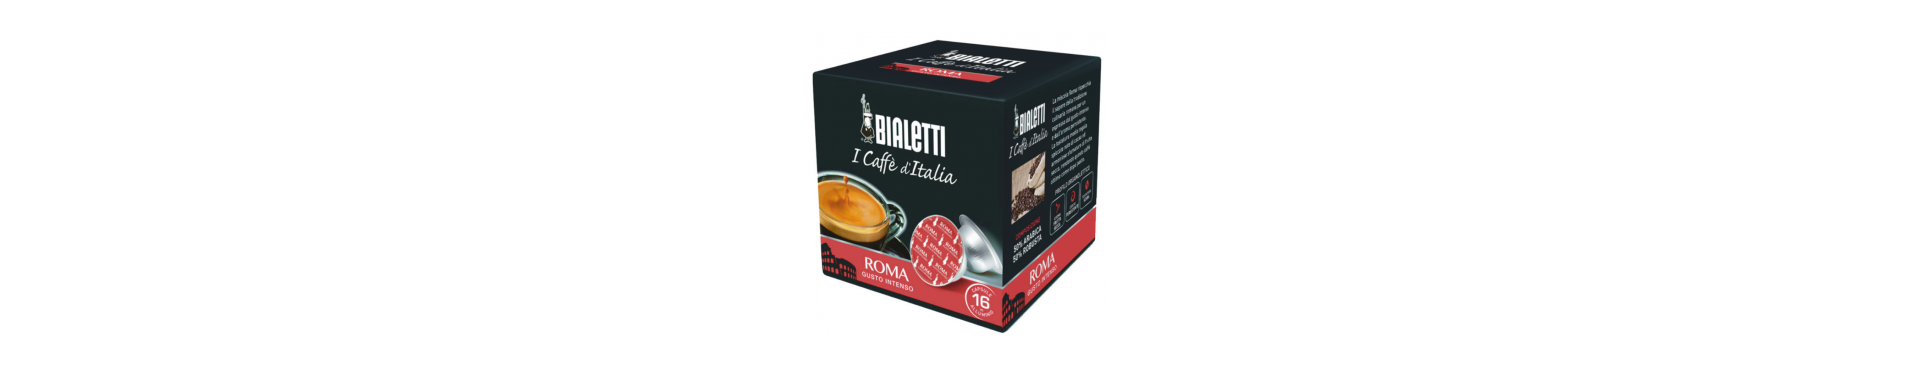 Capsule Bialetti originali